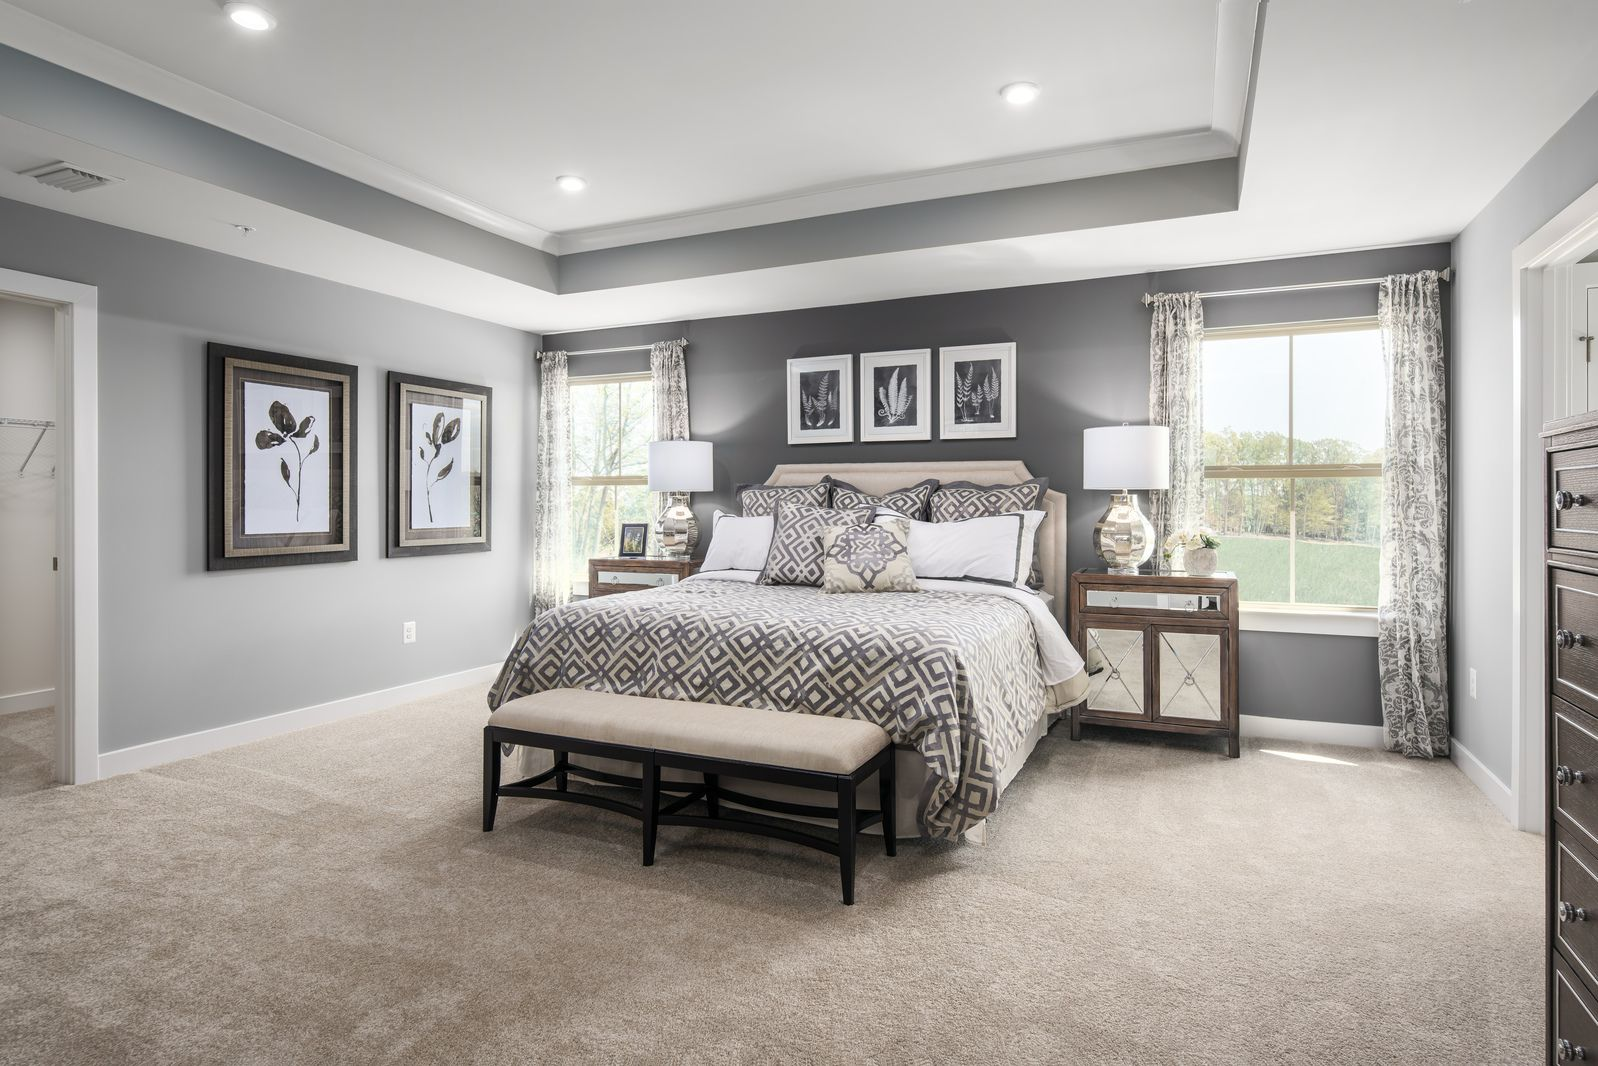 Bedroom featured in the Roanoke By Ryan Homes in Philadelphia, NJ